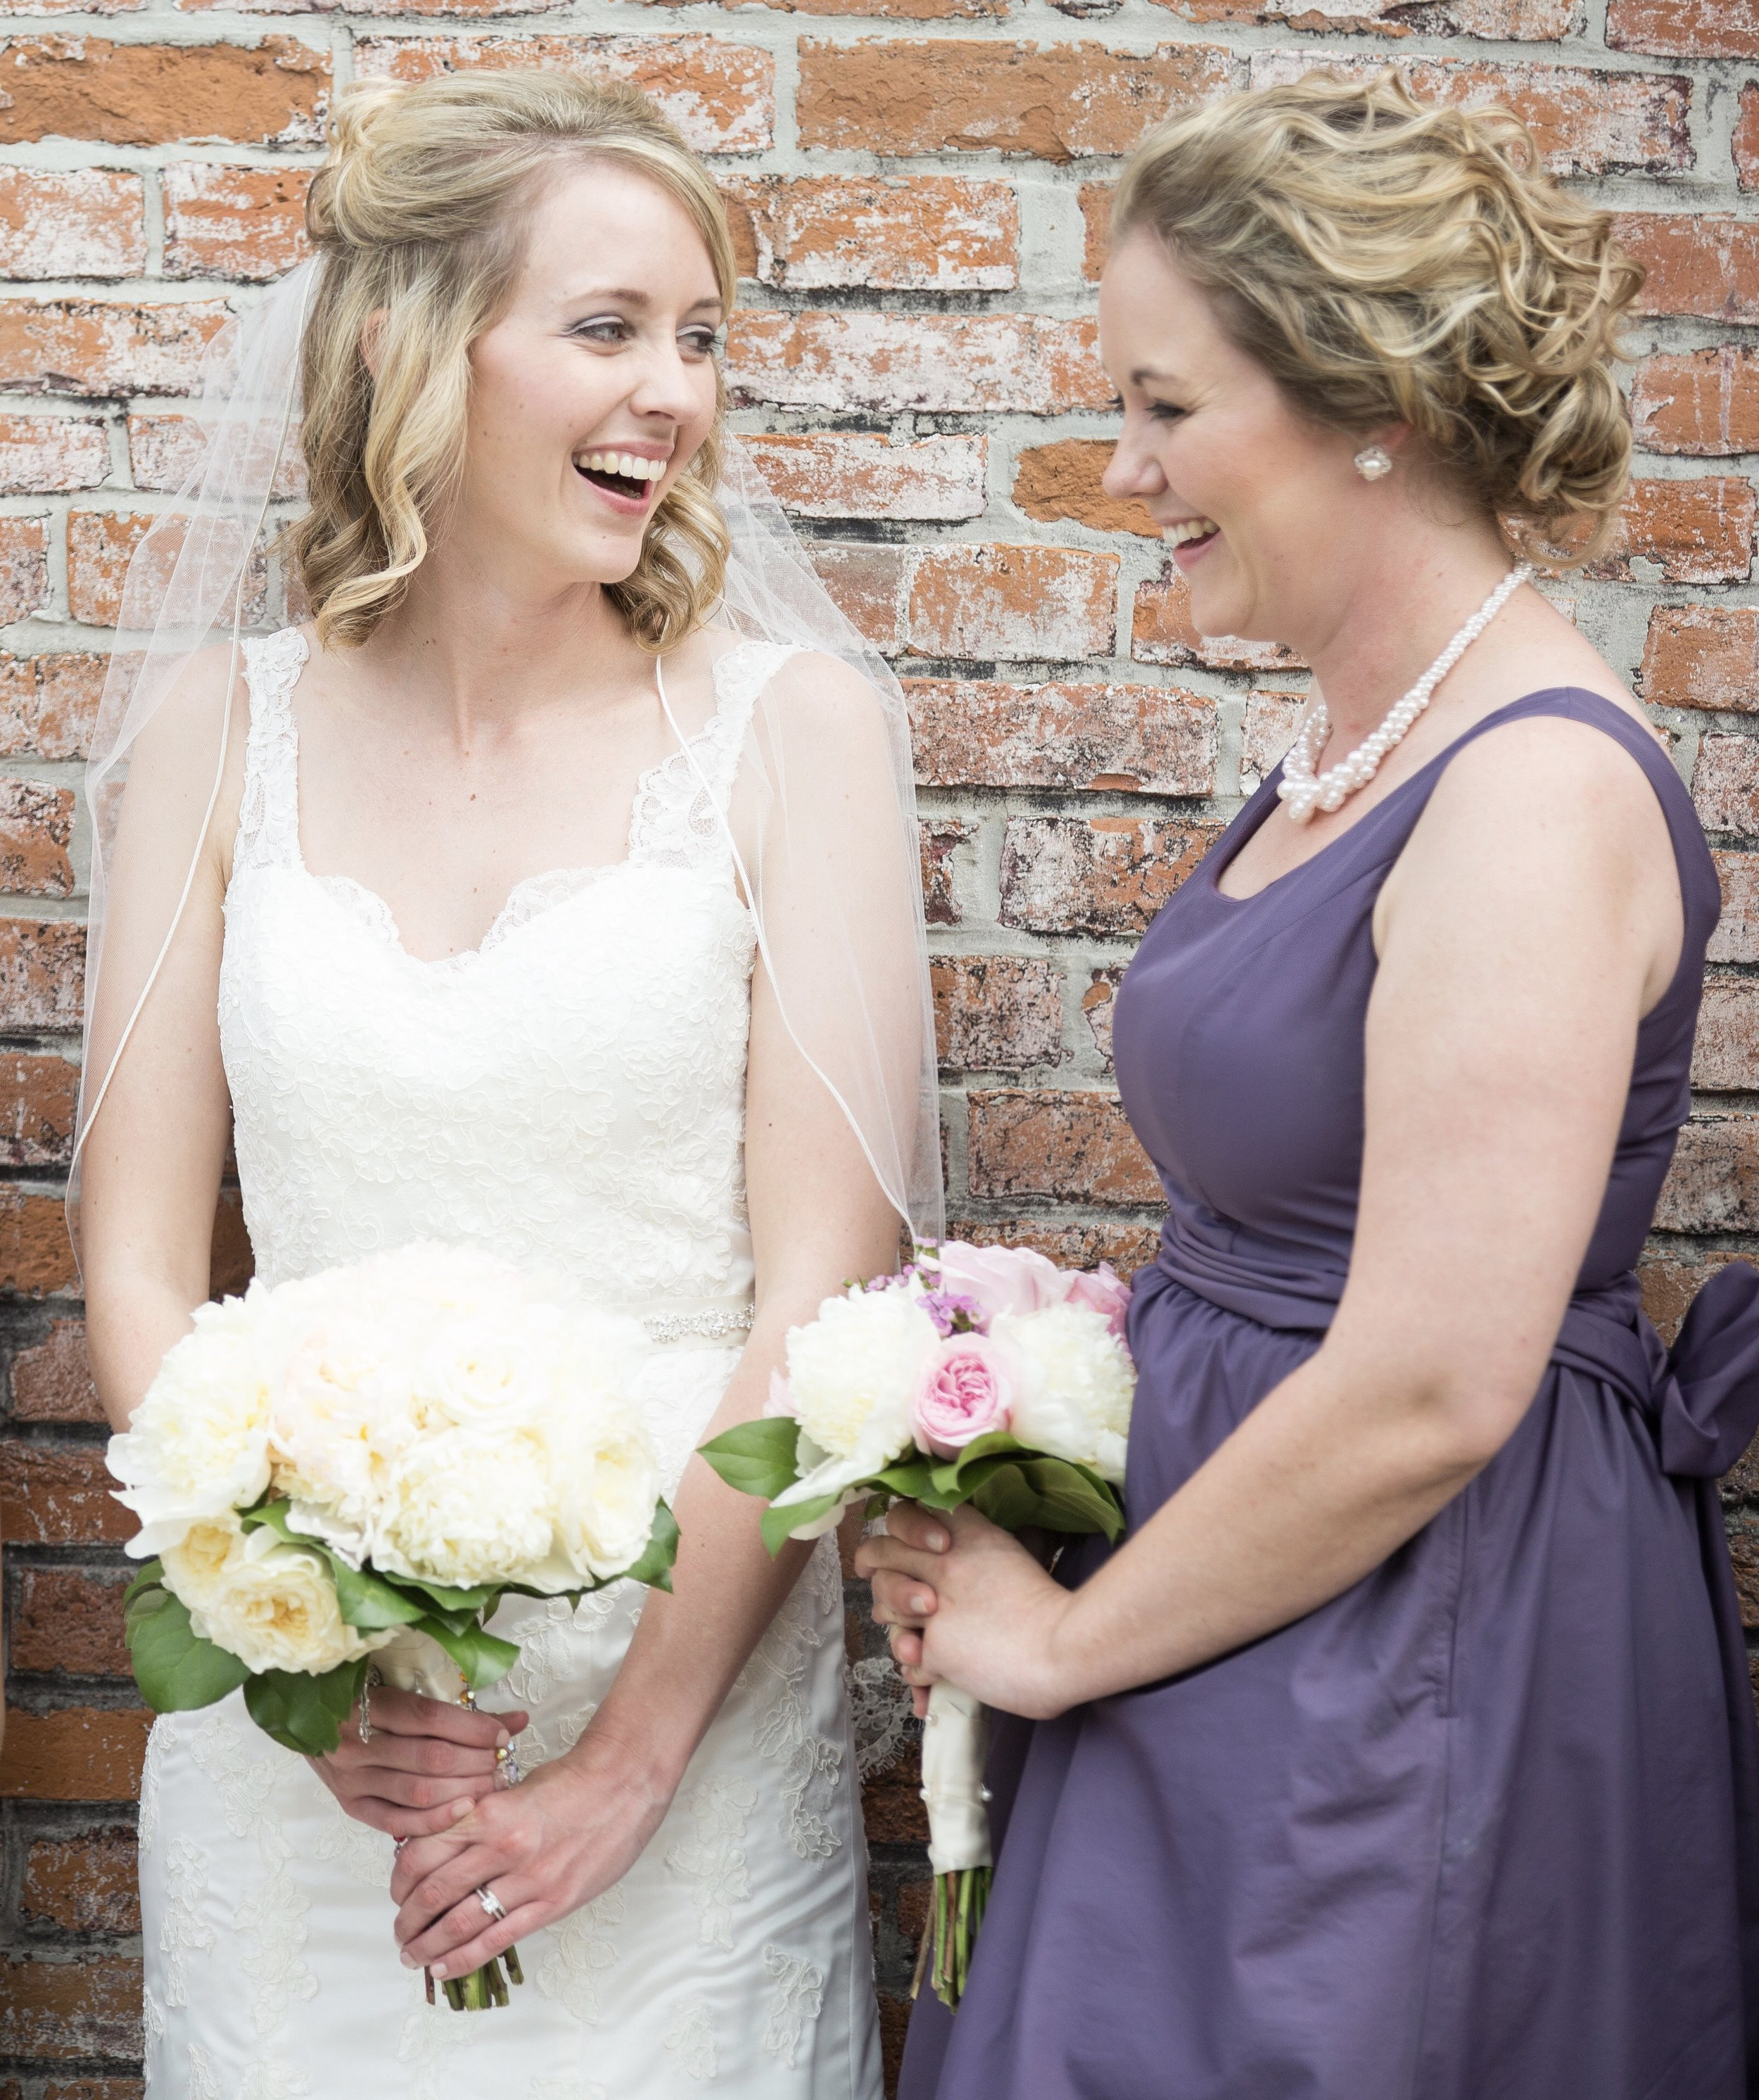 Wedding photos by White-Klump Photography